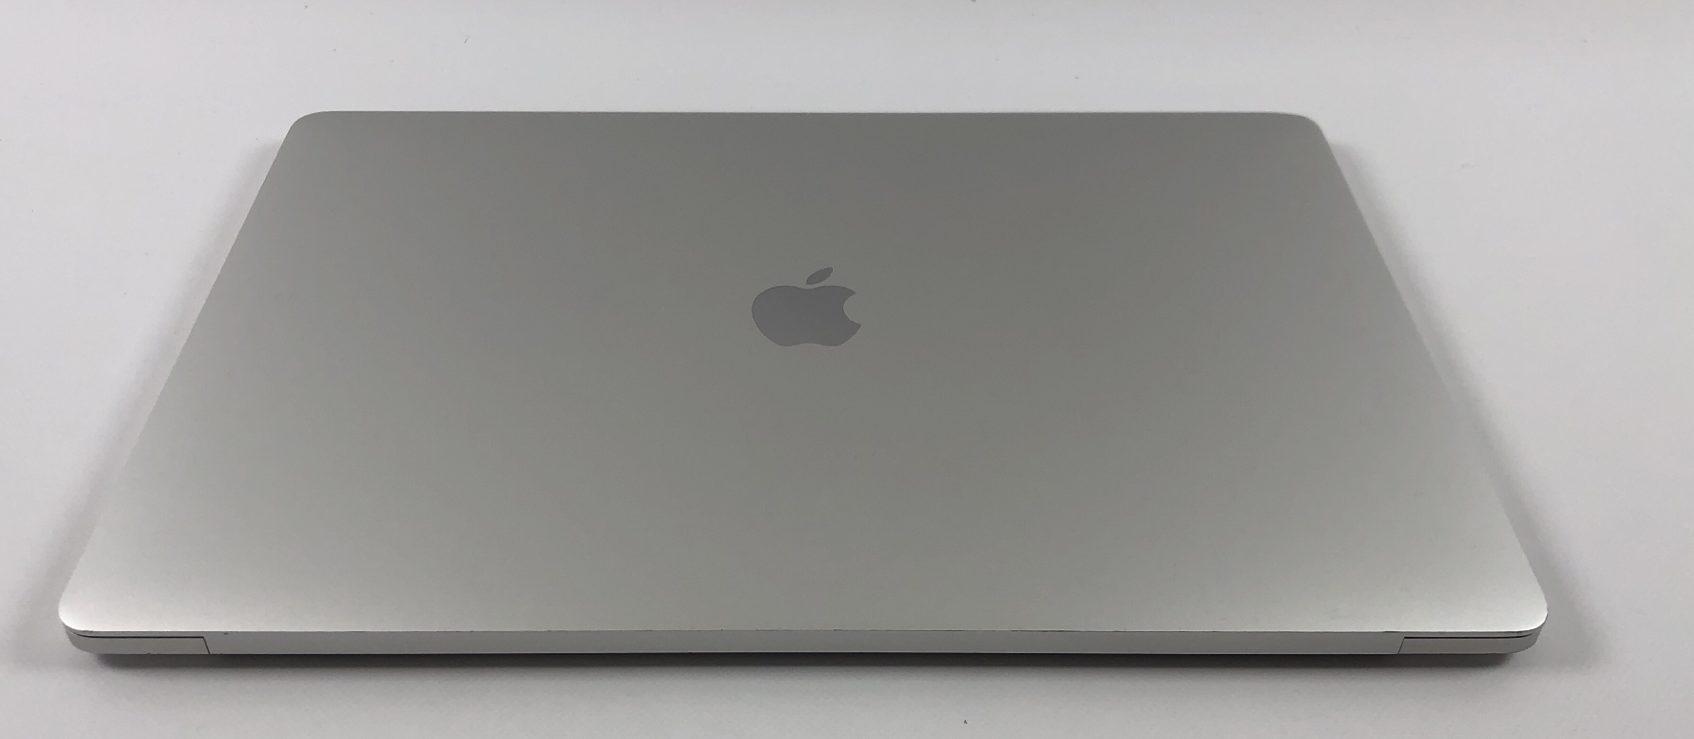 "MacBook Pro 15"" Touch Bar Mid 2017 (Intel Quad-Core i7 3.1 GHz 16 GB RAM 1 TB SSD), Silver, Intel Quad-Core i7 3.1 GHz, 16 GB RAM, 1 TB SSD, image 2"